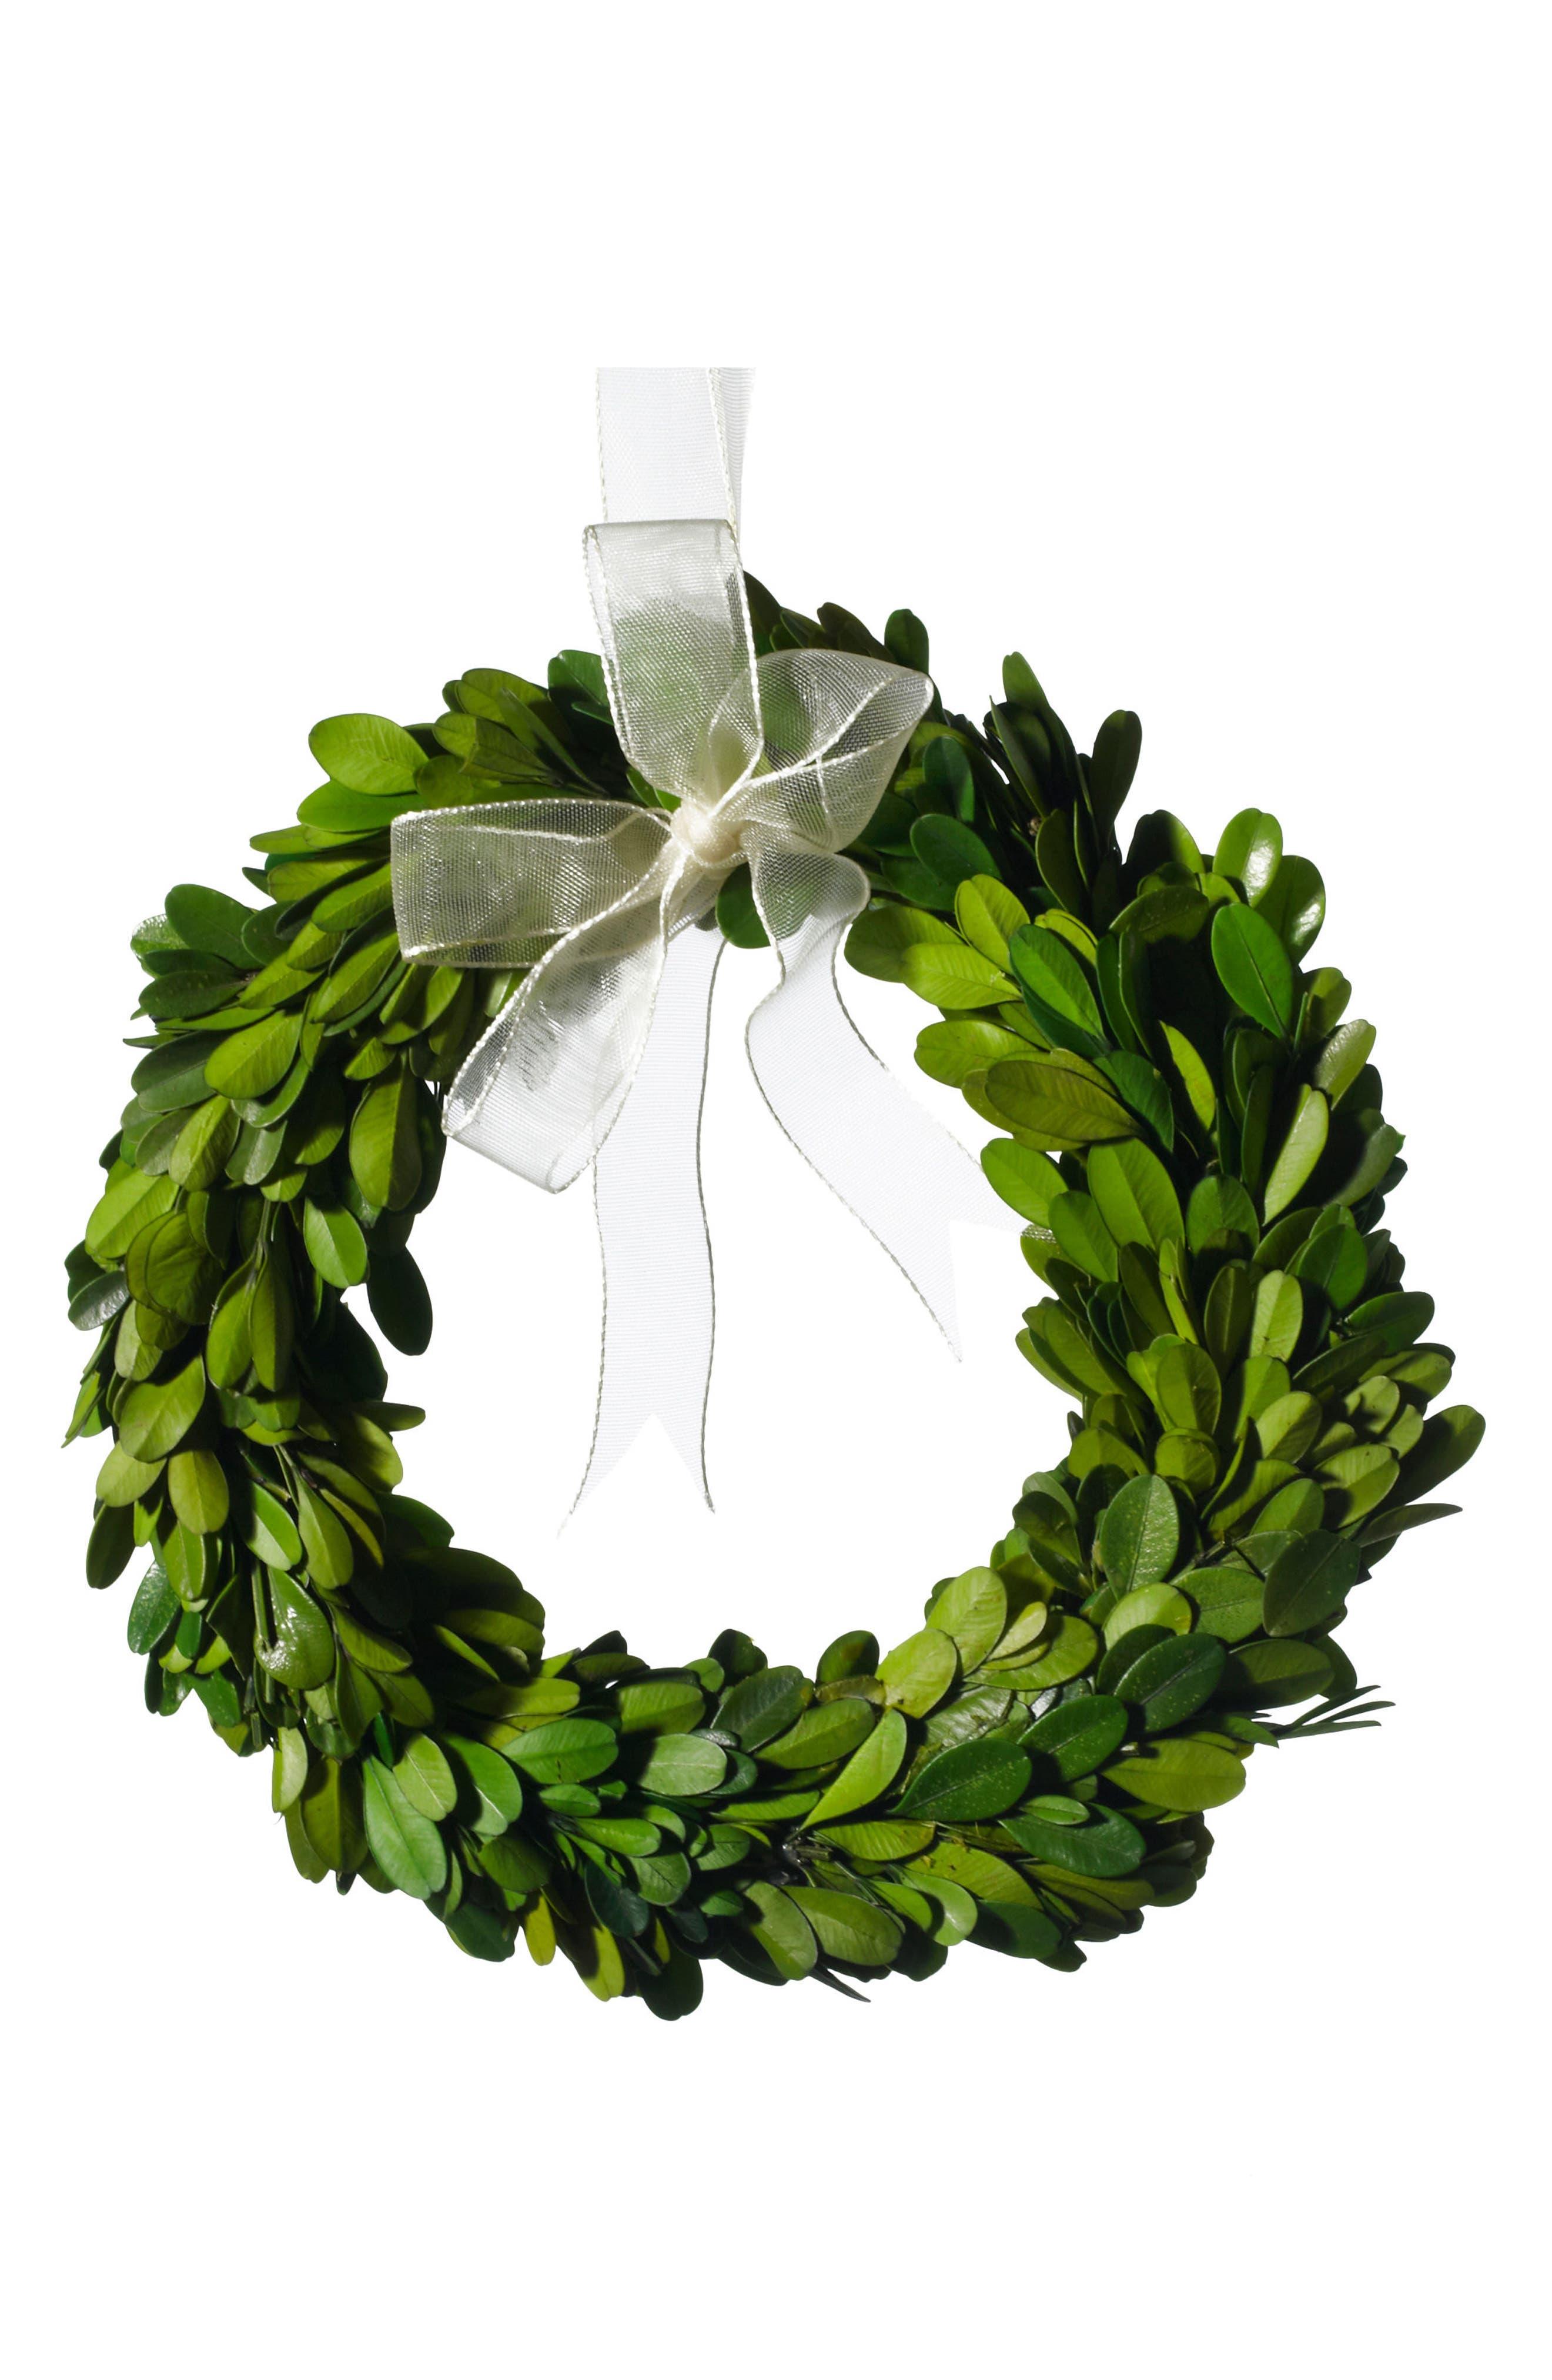 Alternate Image 1 Selected - Accent Decor Mini Boxwood Wreath